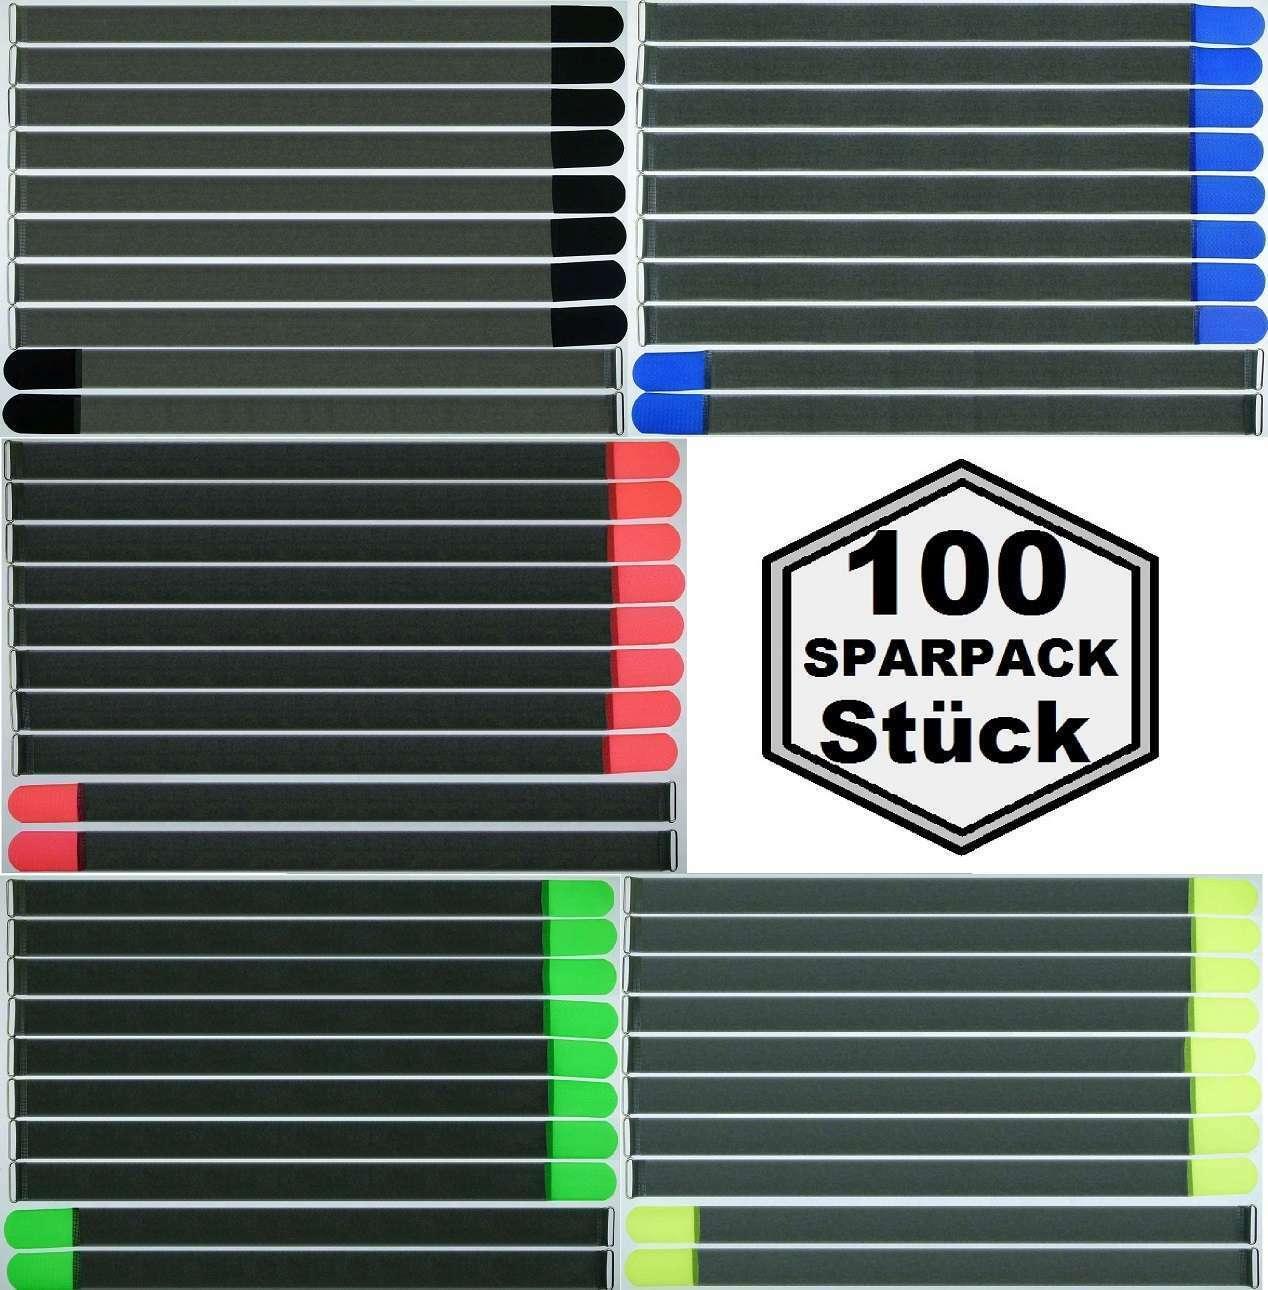 100x CABLE VELCRO FK 80 cm x 50 mm-schwarz, Blau, Neon Grün, rot and Gelb